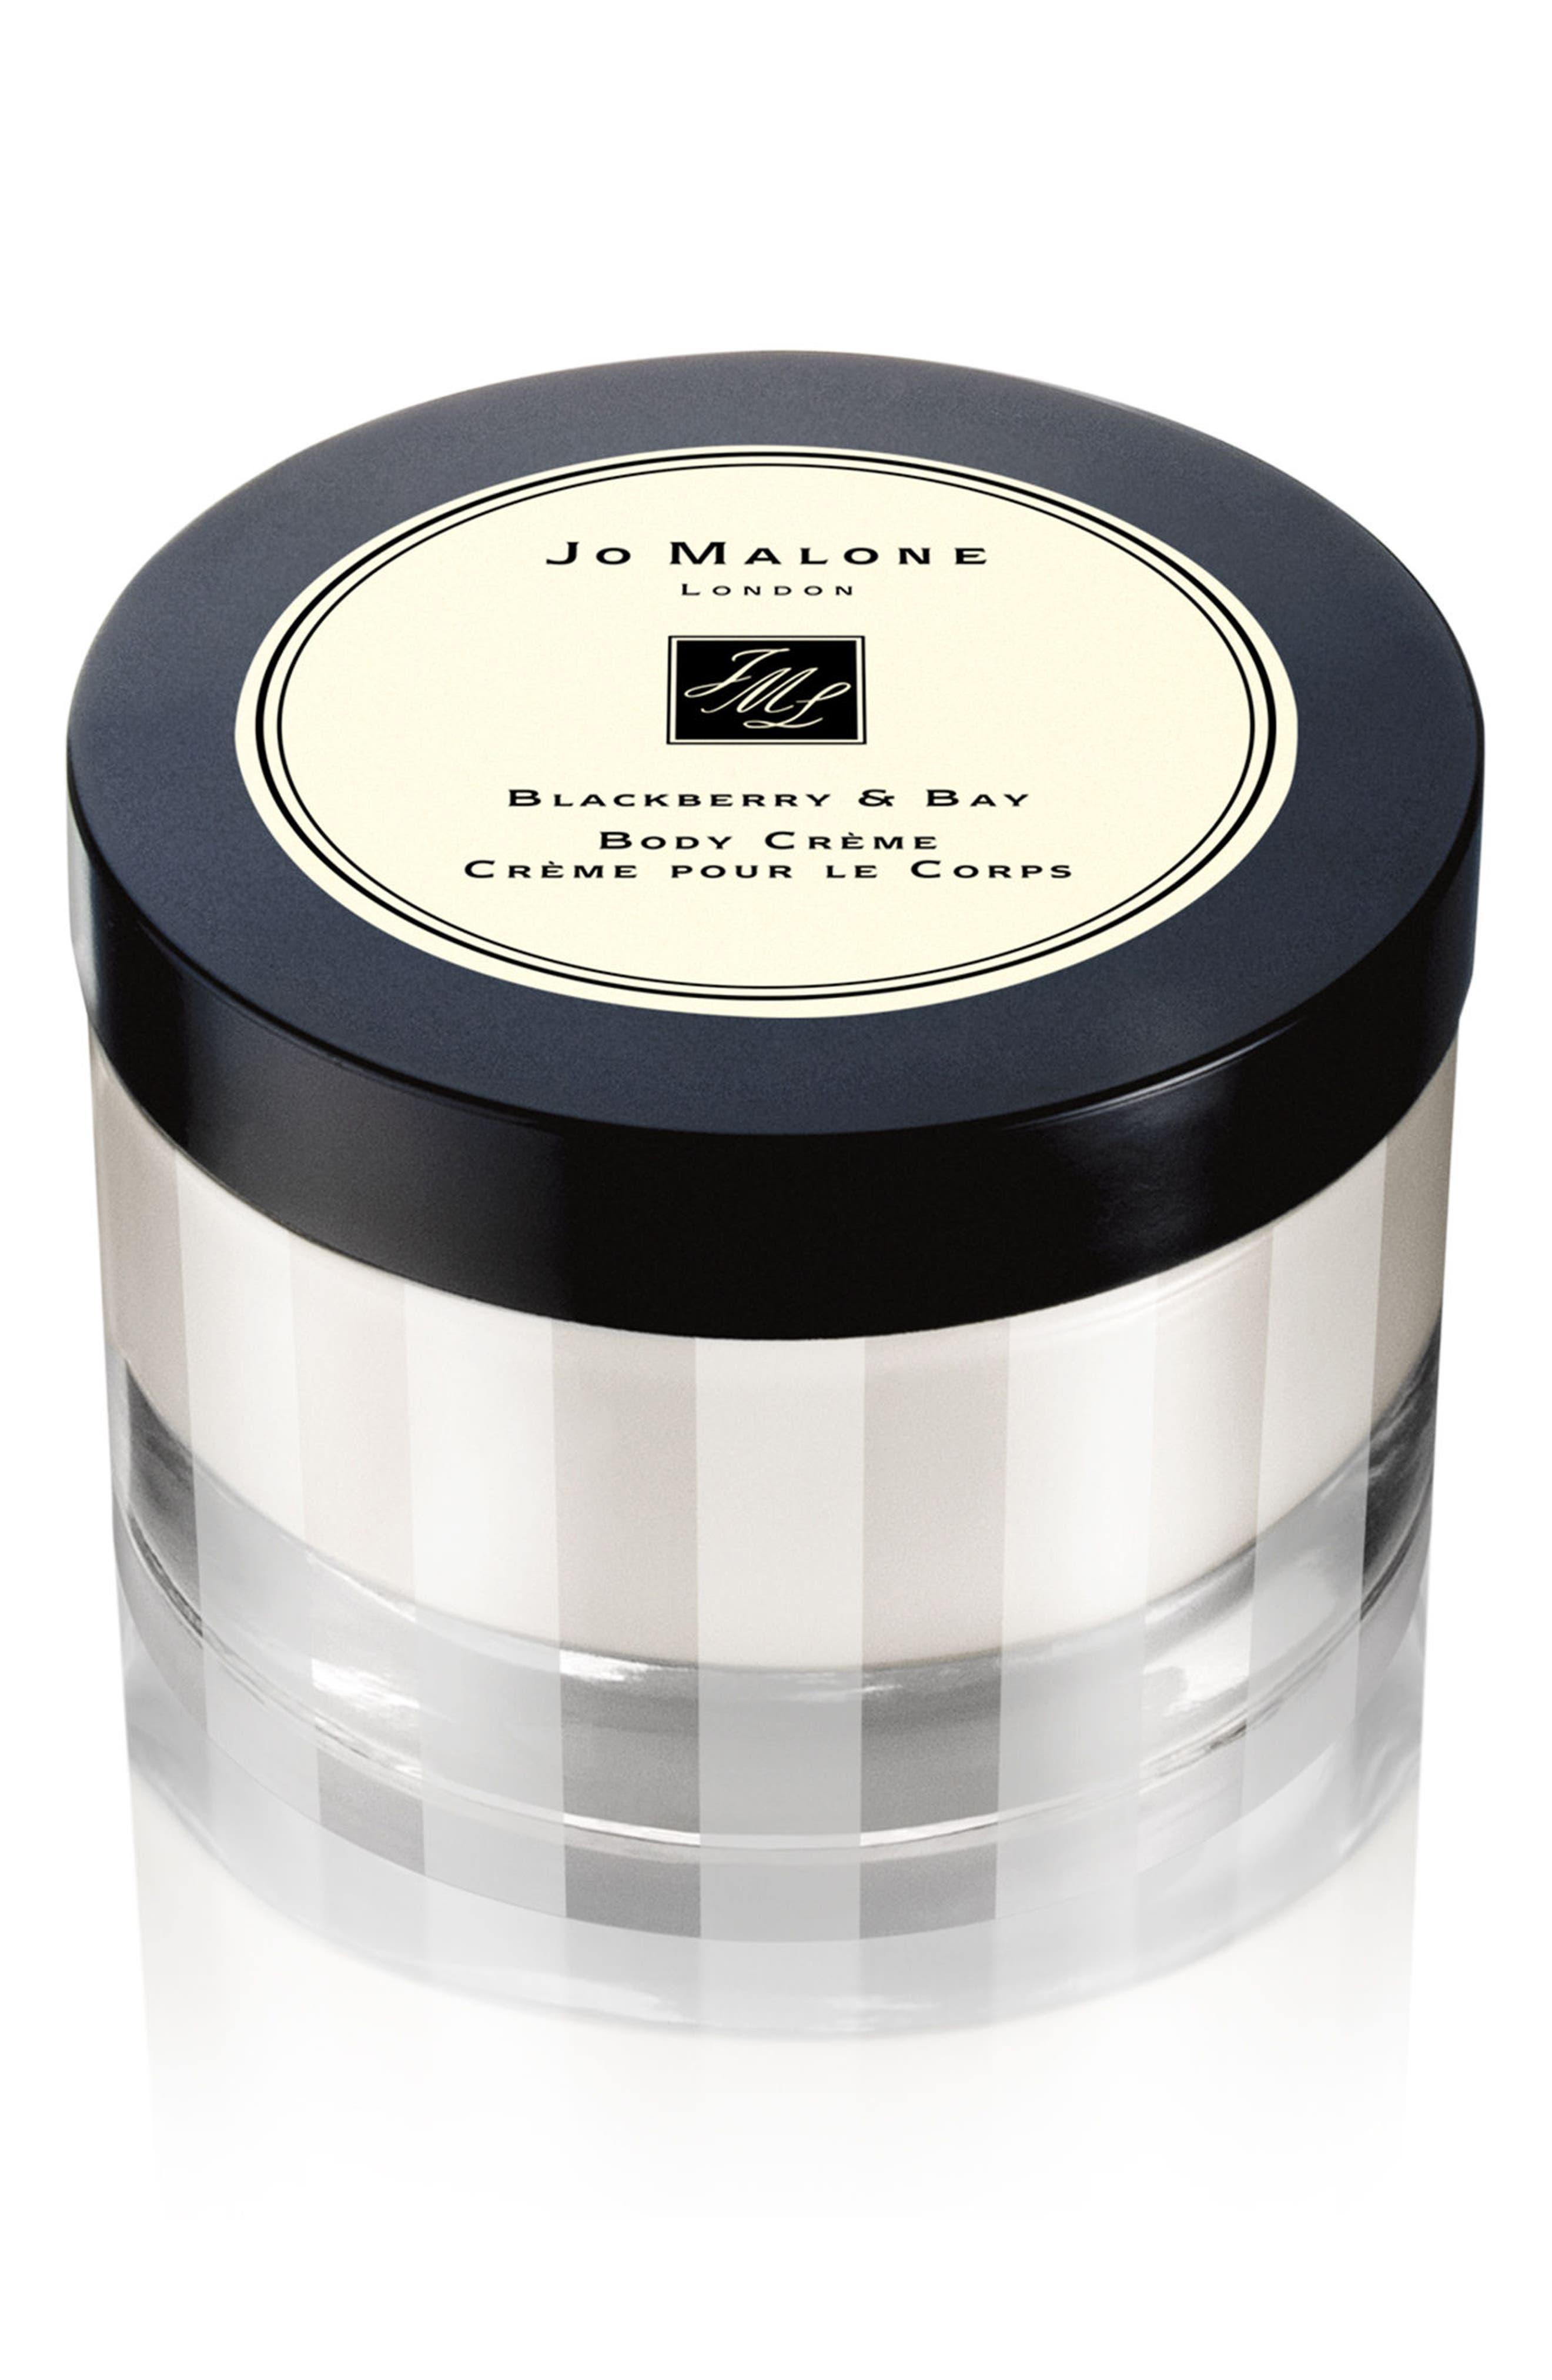 Alternate Image 1 Selected - Jo Malone London™ Blackberry & Bay Body Crème